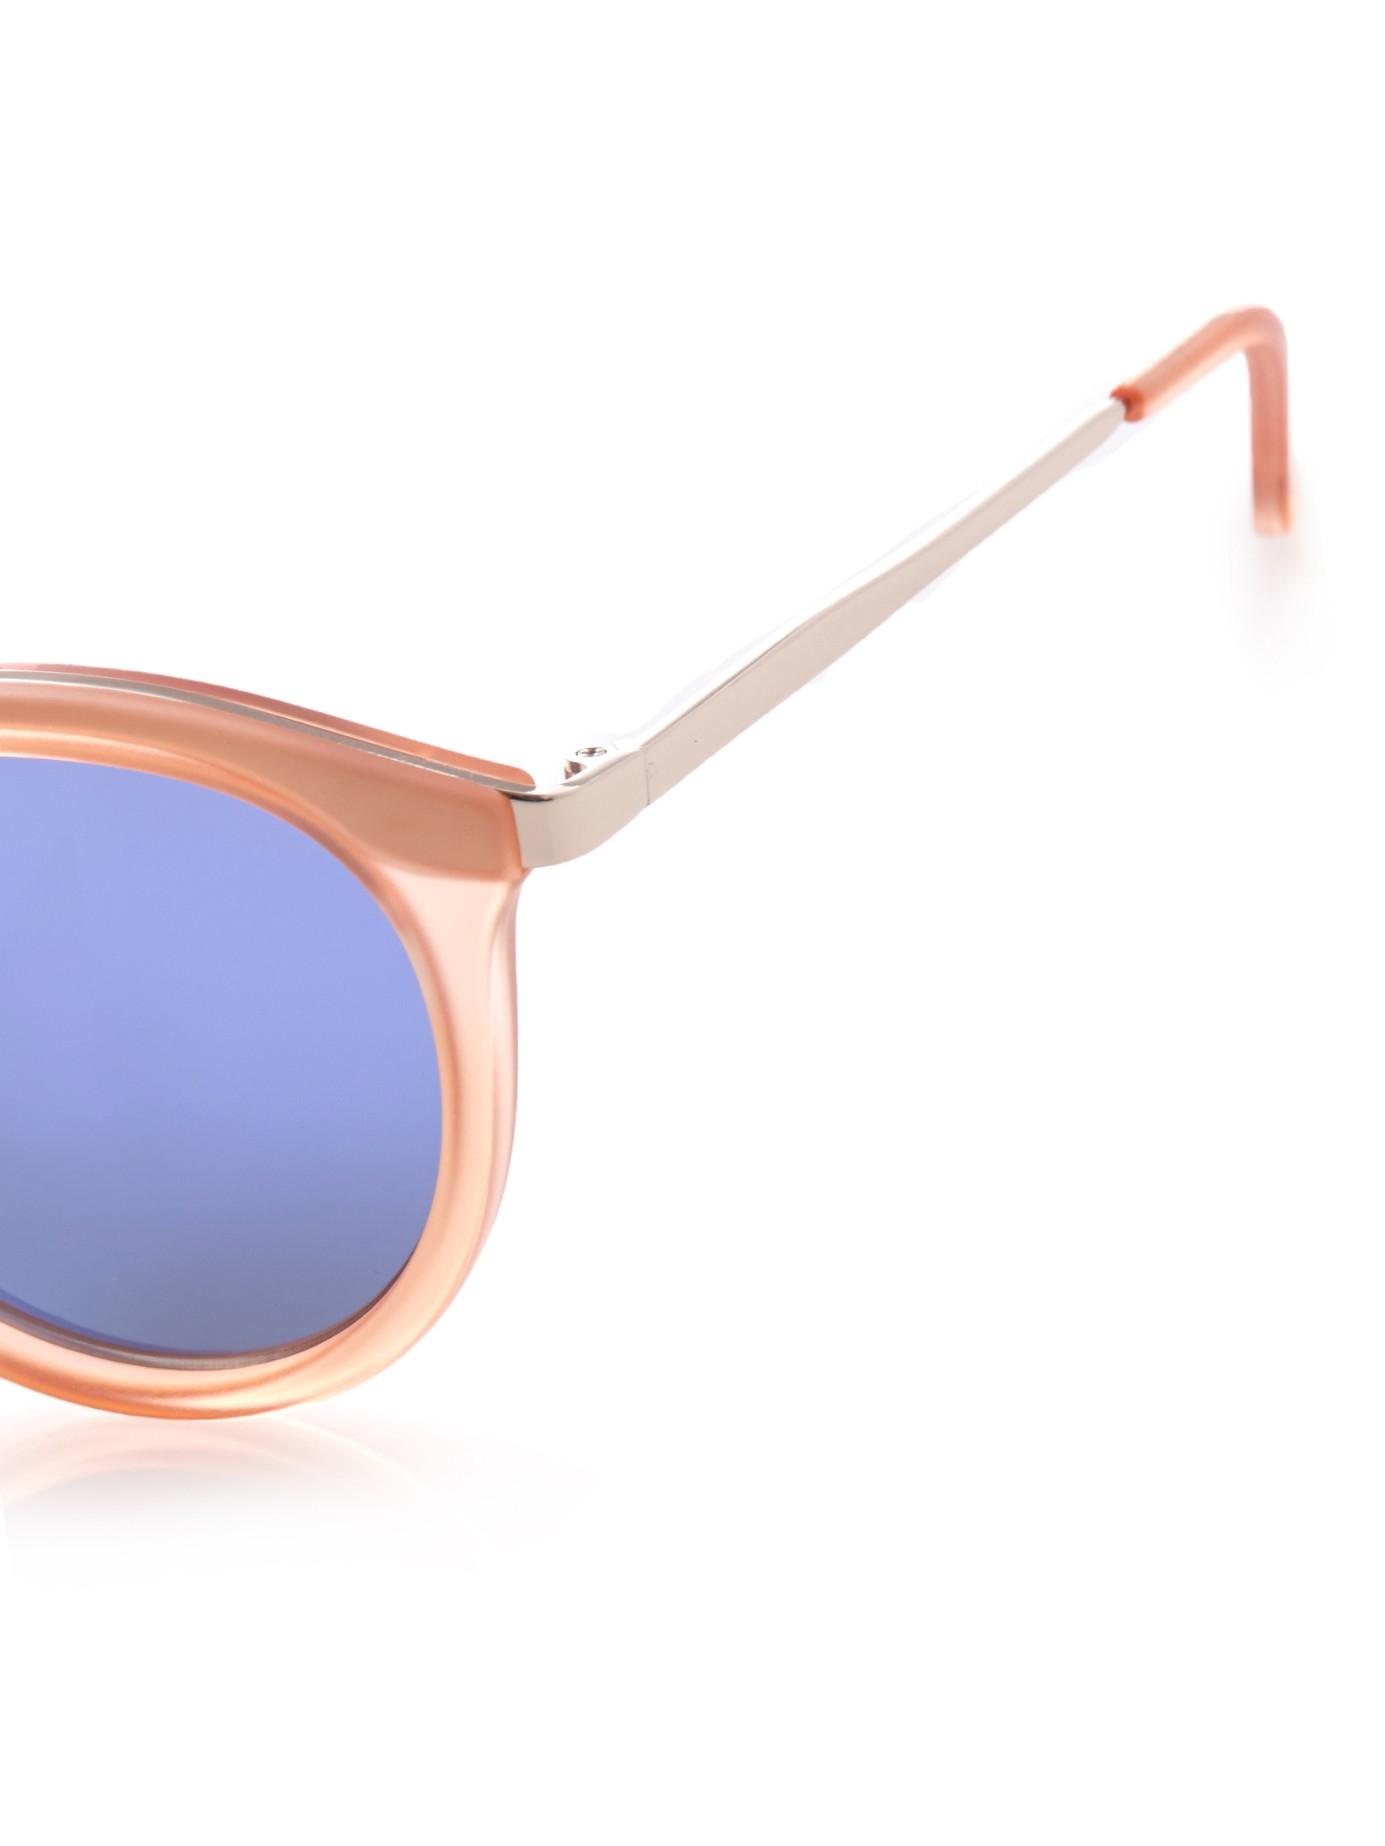 52ebfd4d54 Lyst - Le Specs No Smirking Sunglasses in Orange